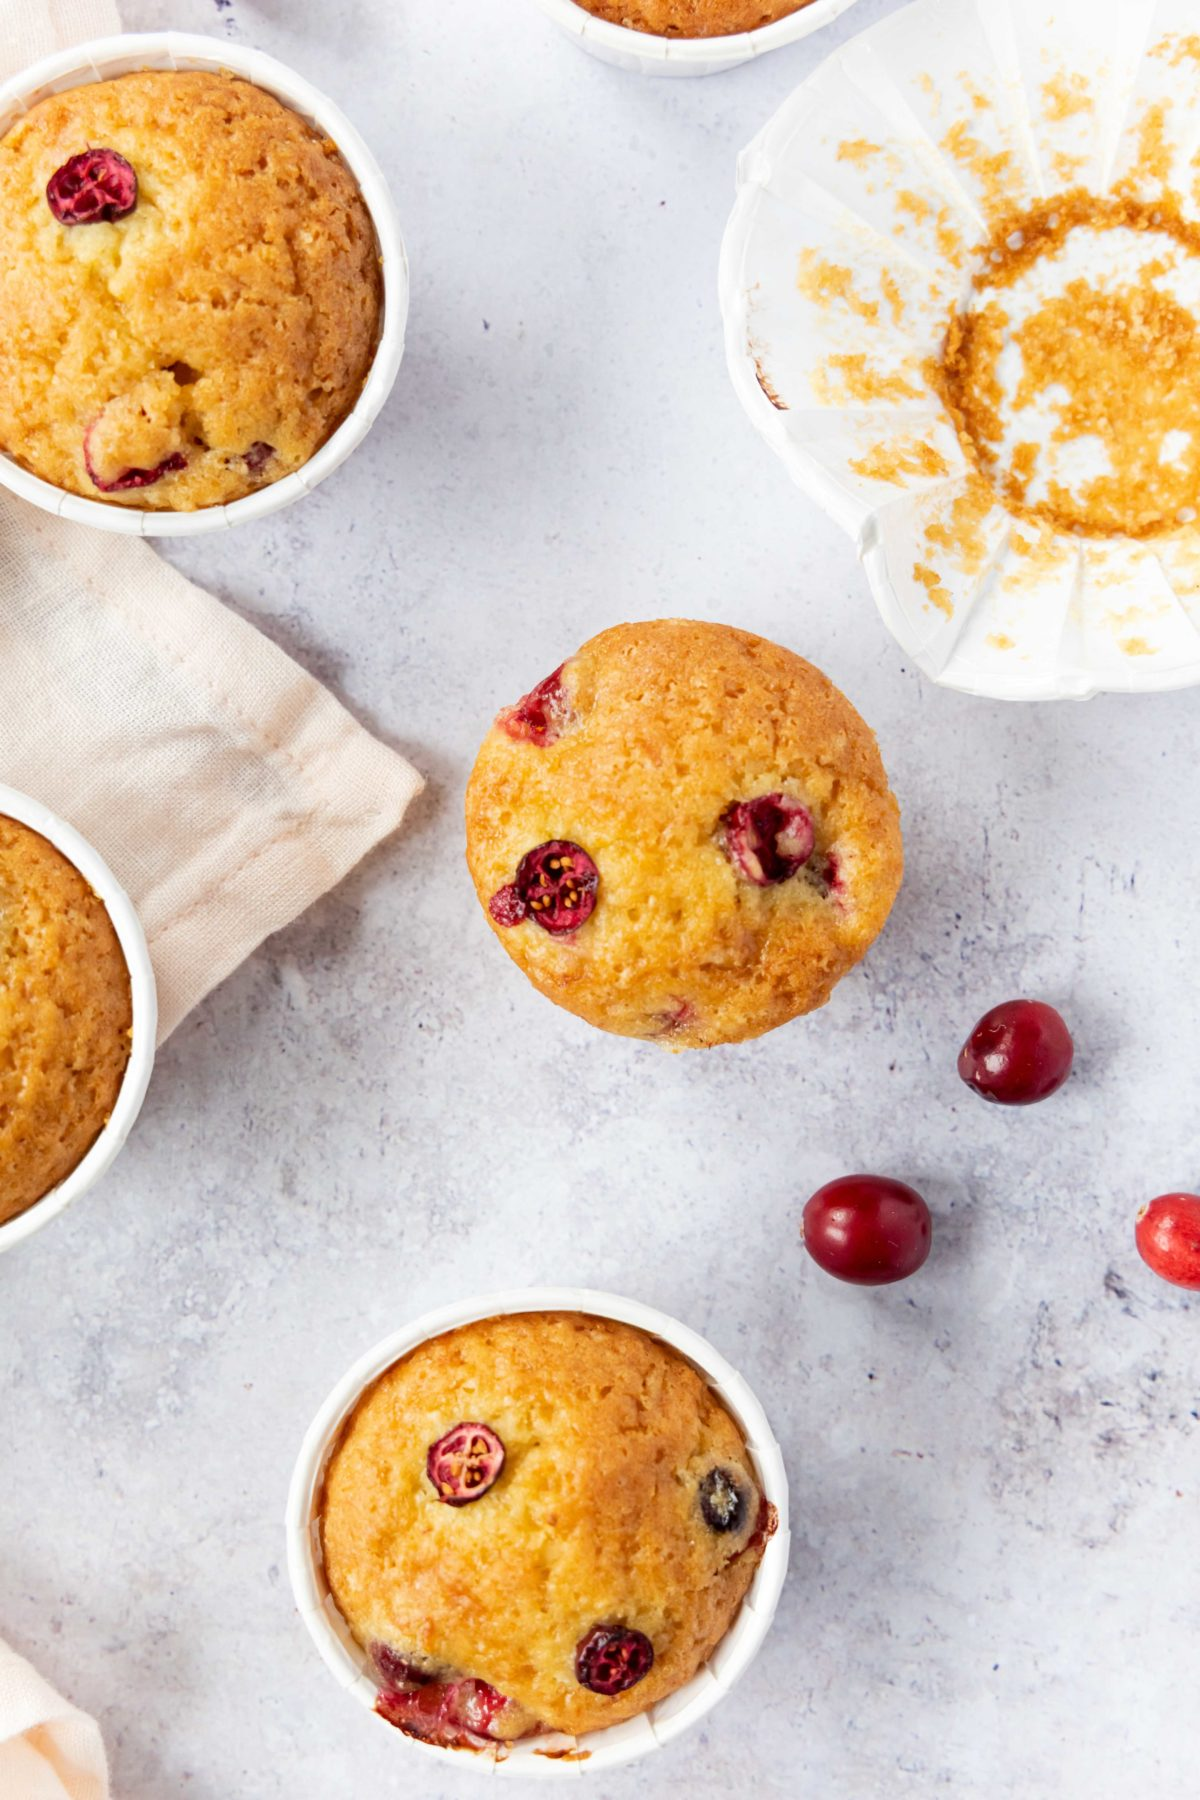 Vegane Cranberry Orangen Muffins // vegan cranberry and orange muffins by https://babyrockmyday.com/vegane-cranberry-orangen-muffins/